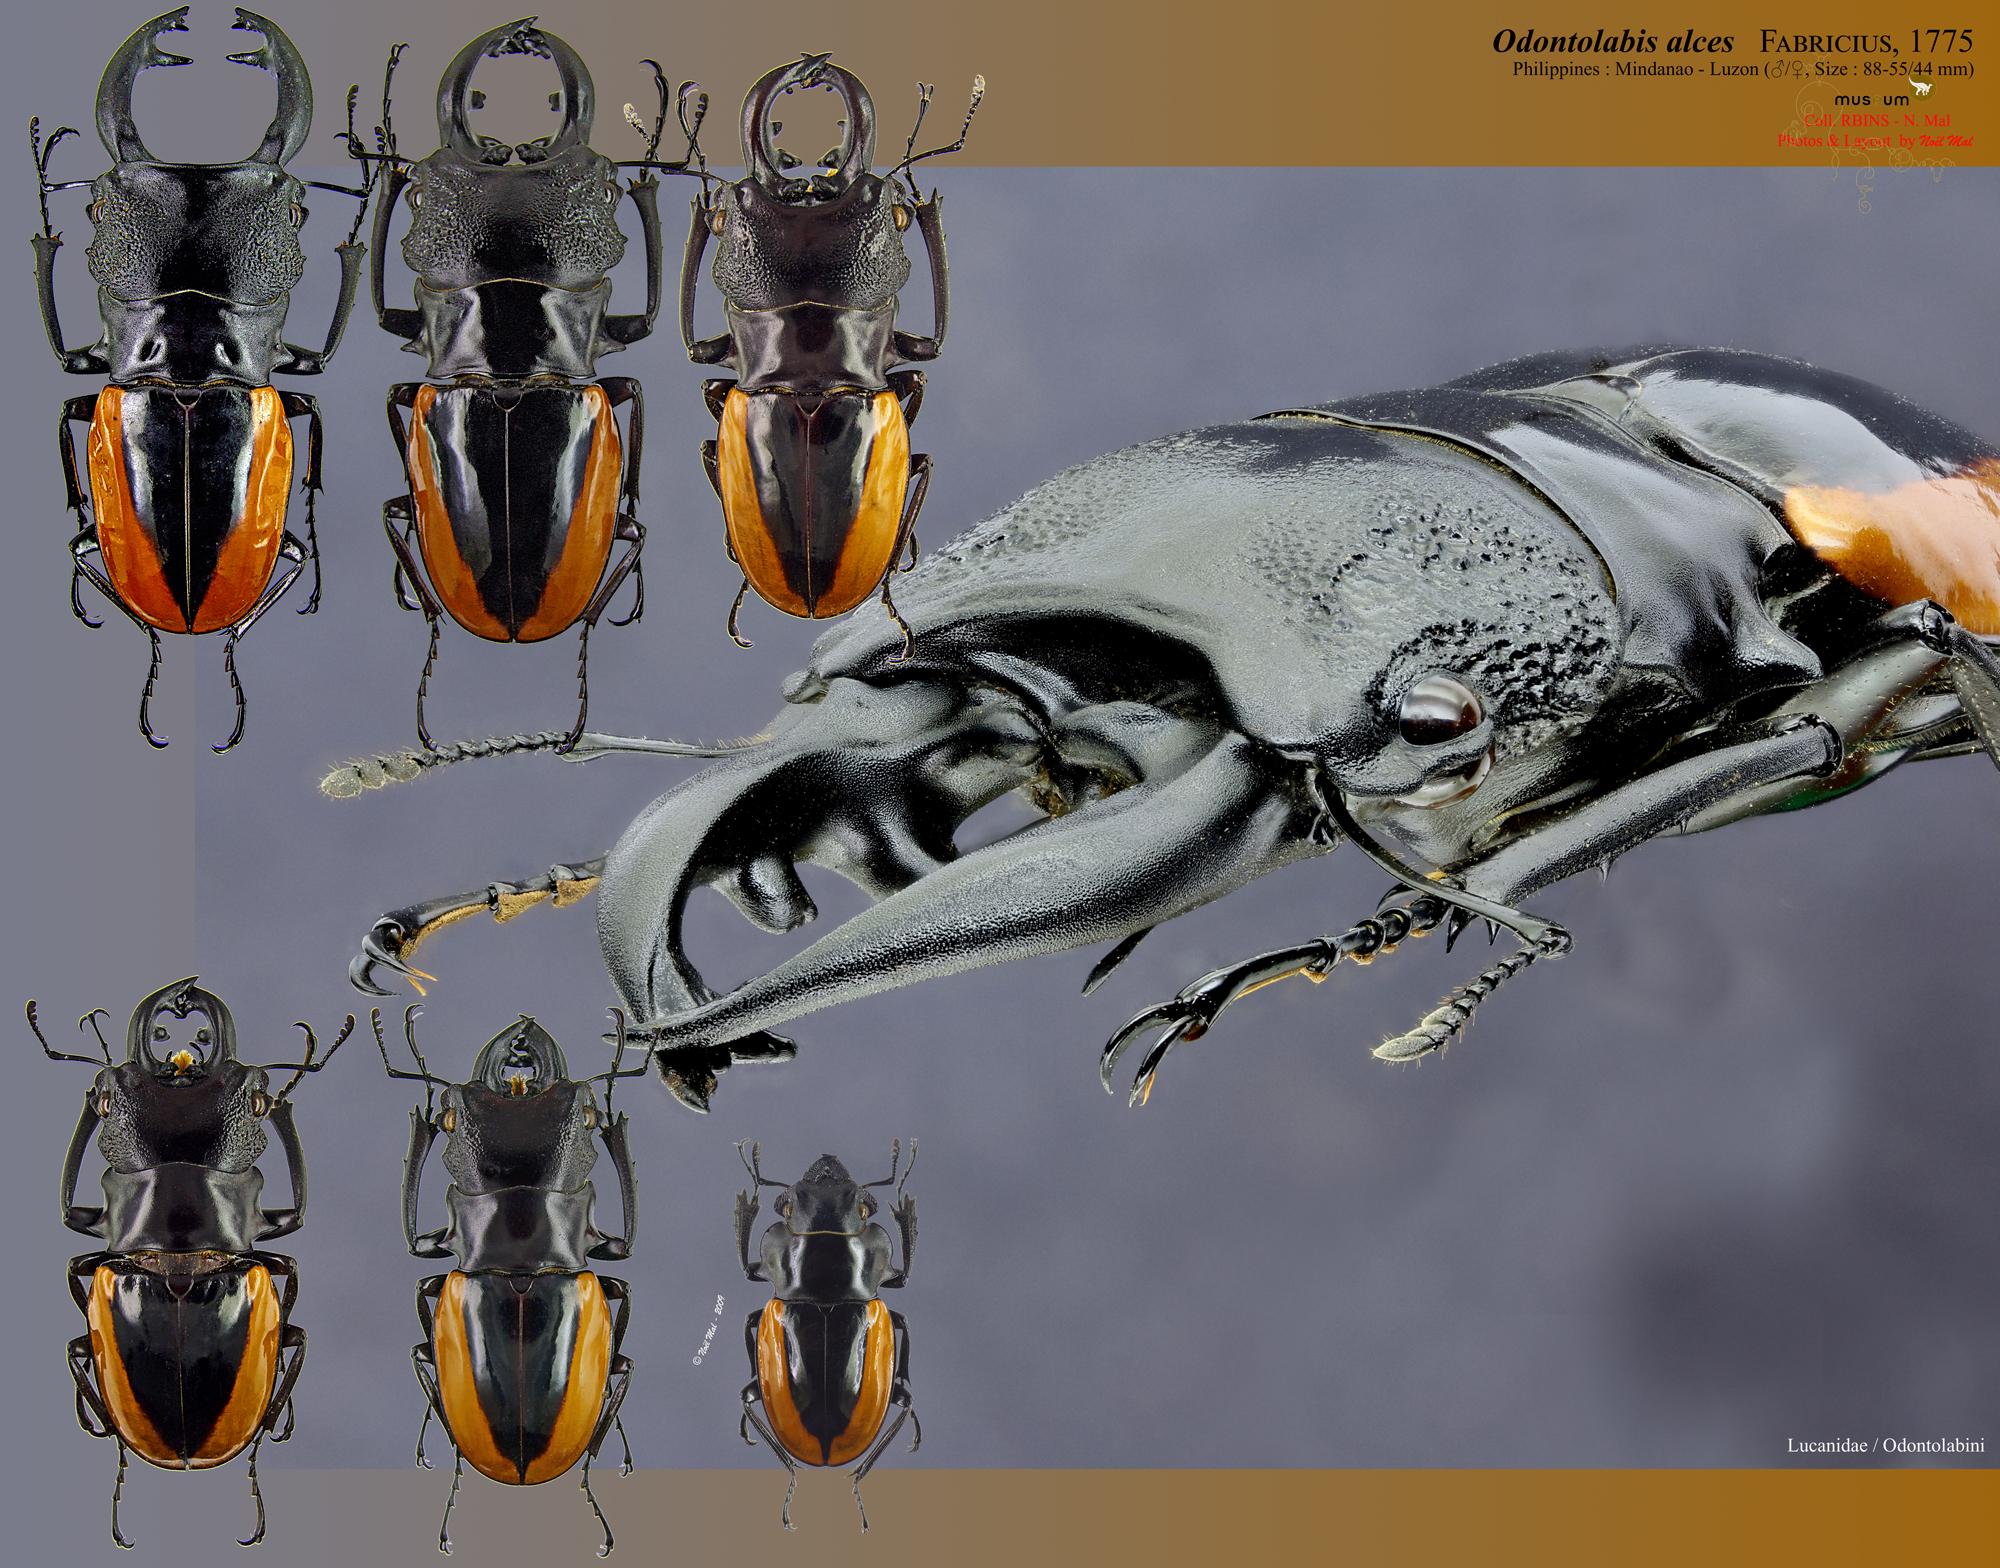 Odontolabis wollastoni.jpg